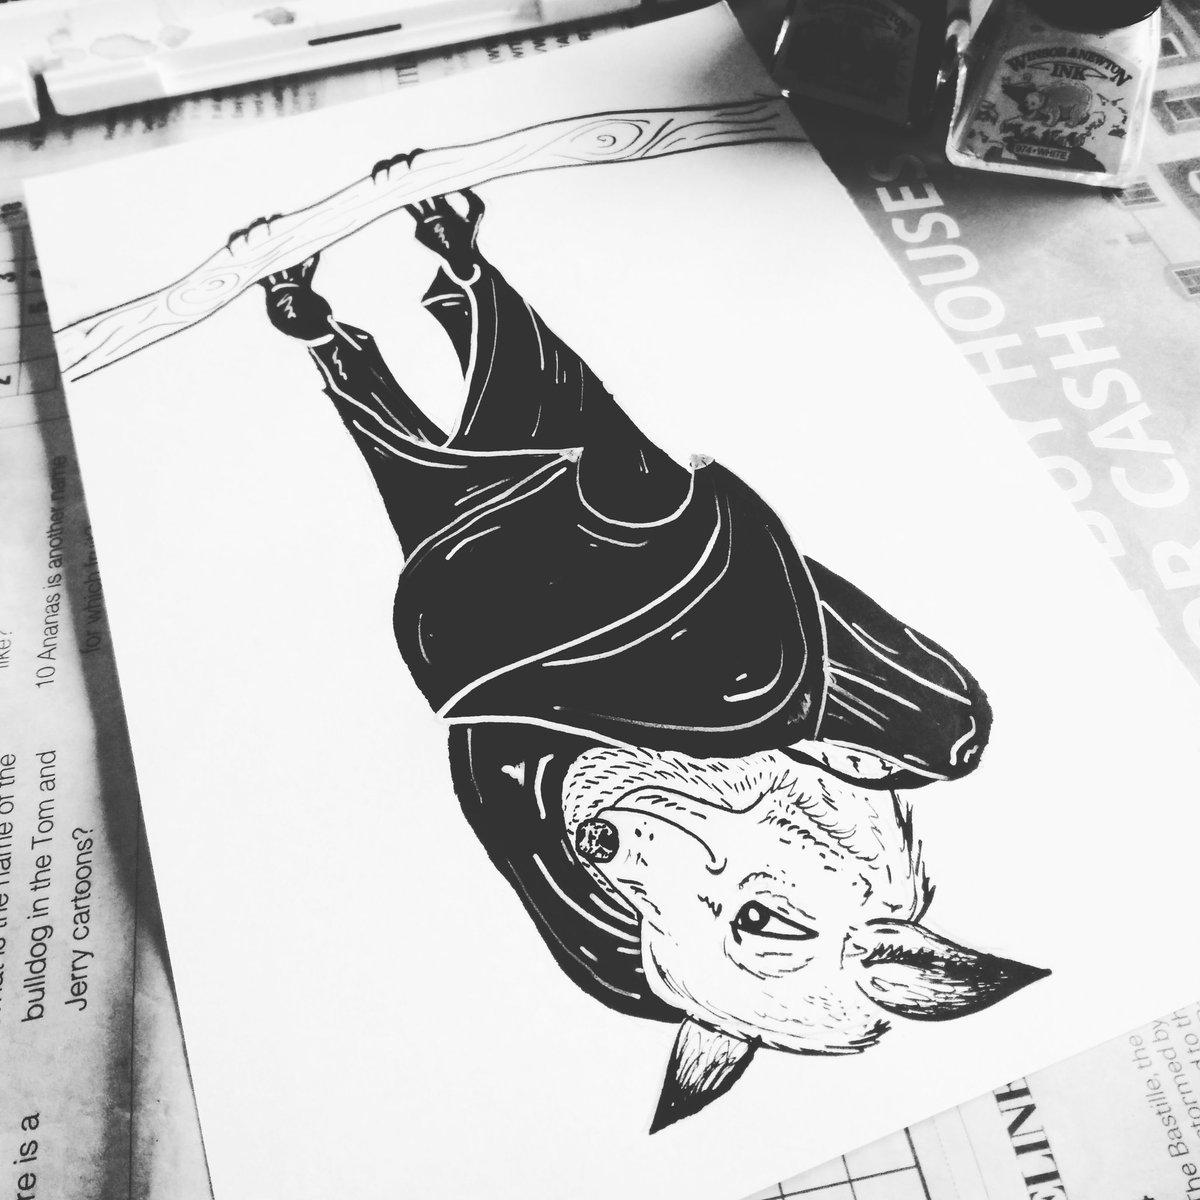 Kates Illustrations On Twitter Little Fruits Bat Fruitbat